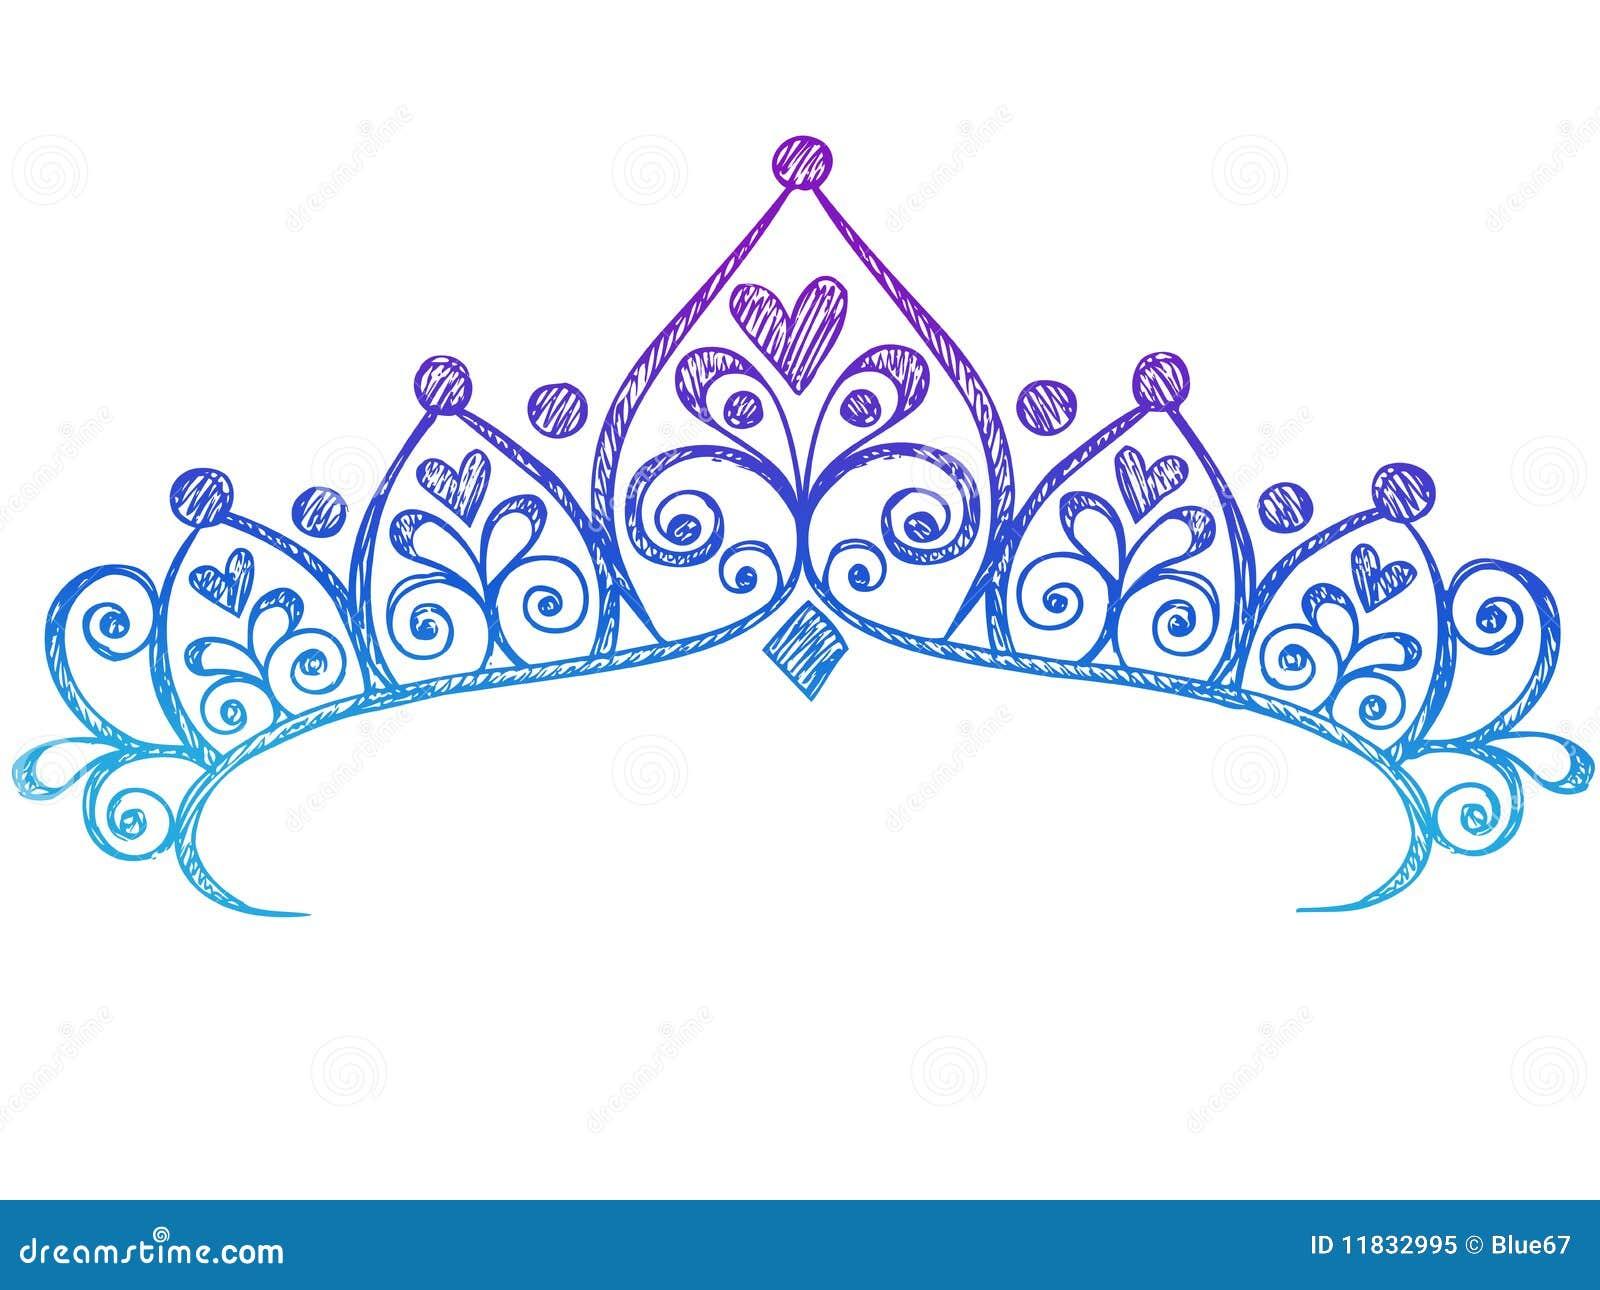 Sketchy Princess Tiara Crown Princess Crown Drawing Tattoo